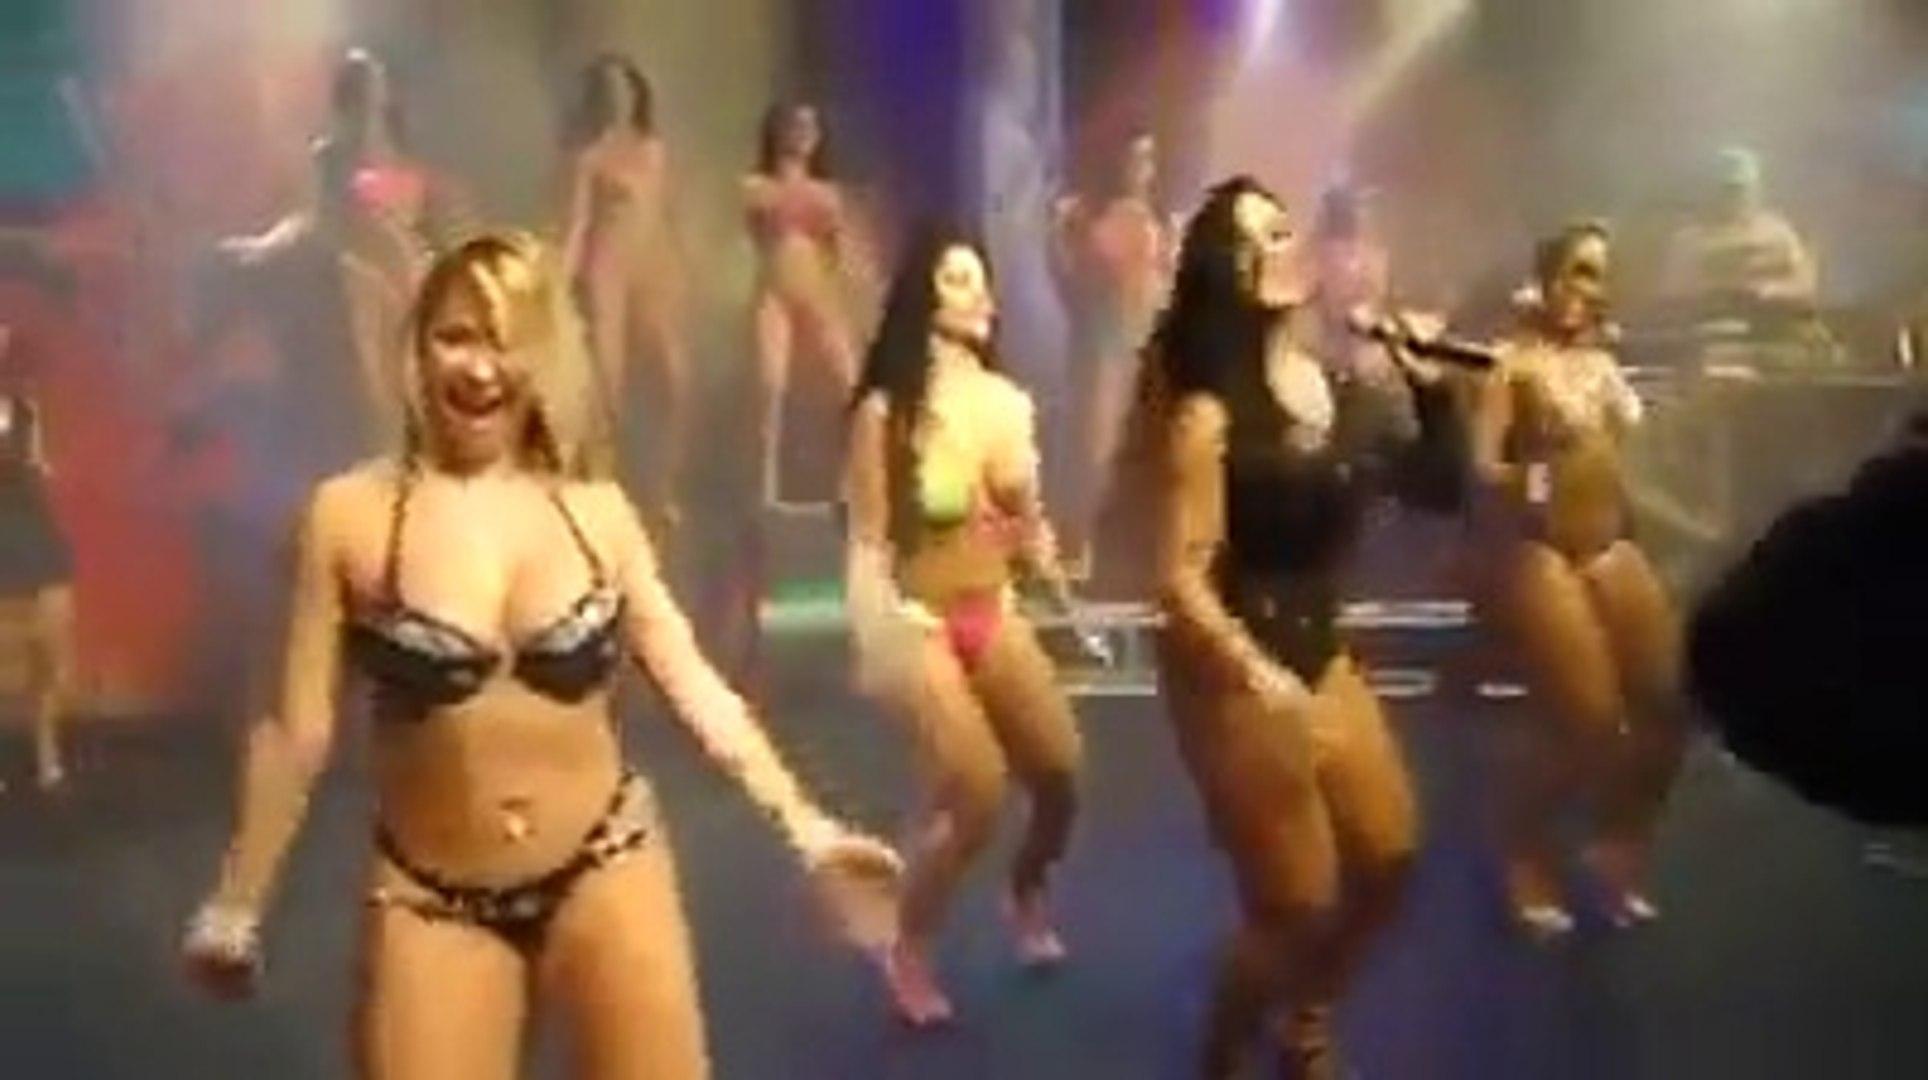 Andressa Soares Video mulher melancia andressa soares